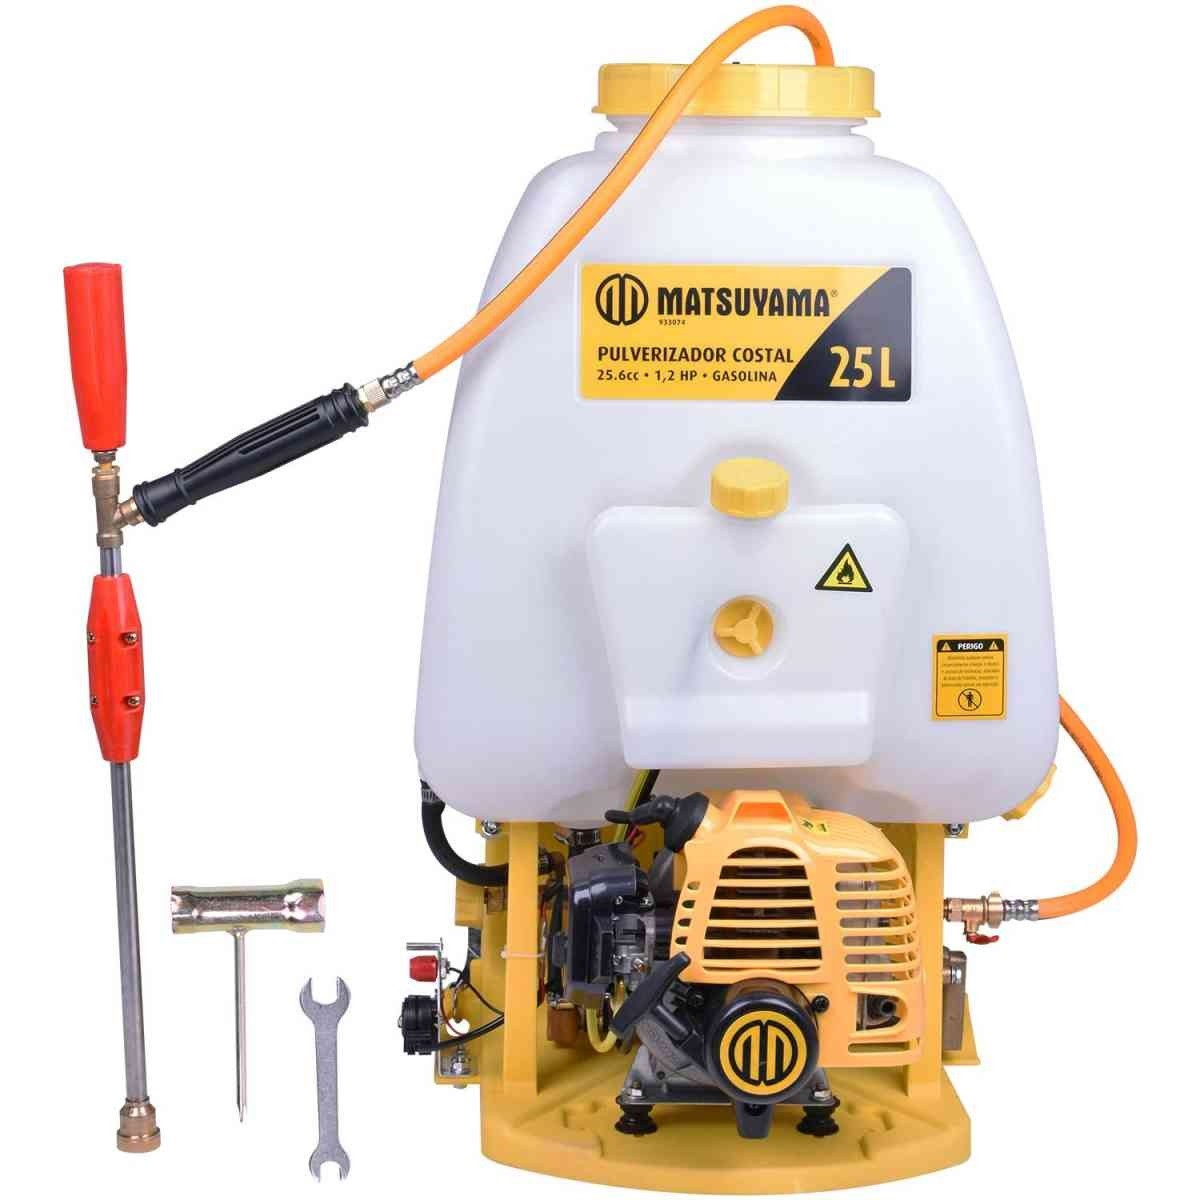 Pulverizador Costal Gasolina 25cc 1.2hp 25 Litros -Matsuyma